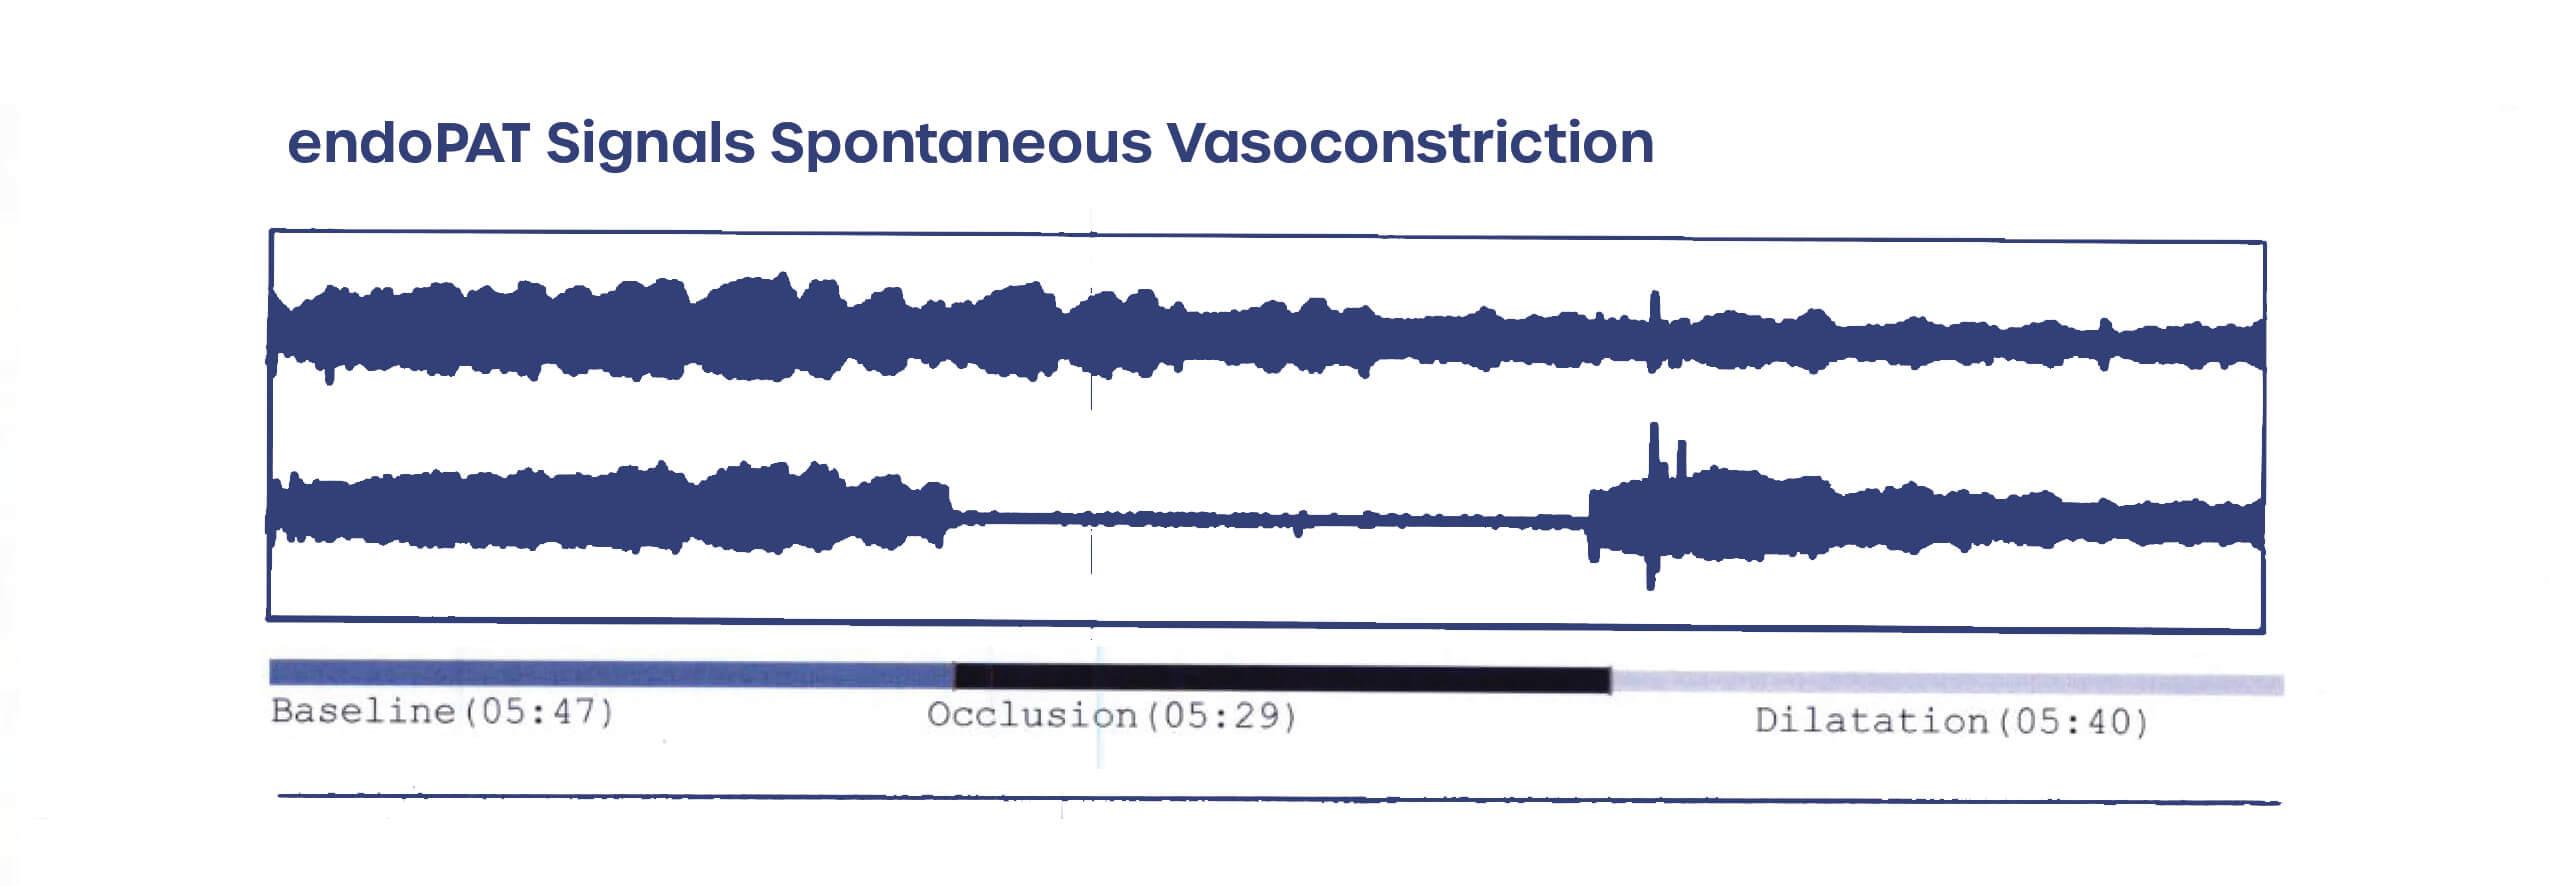 EndoPAT signals spontaneous vasoconstriction